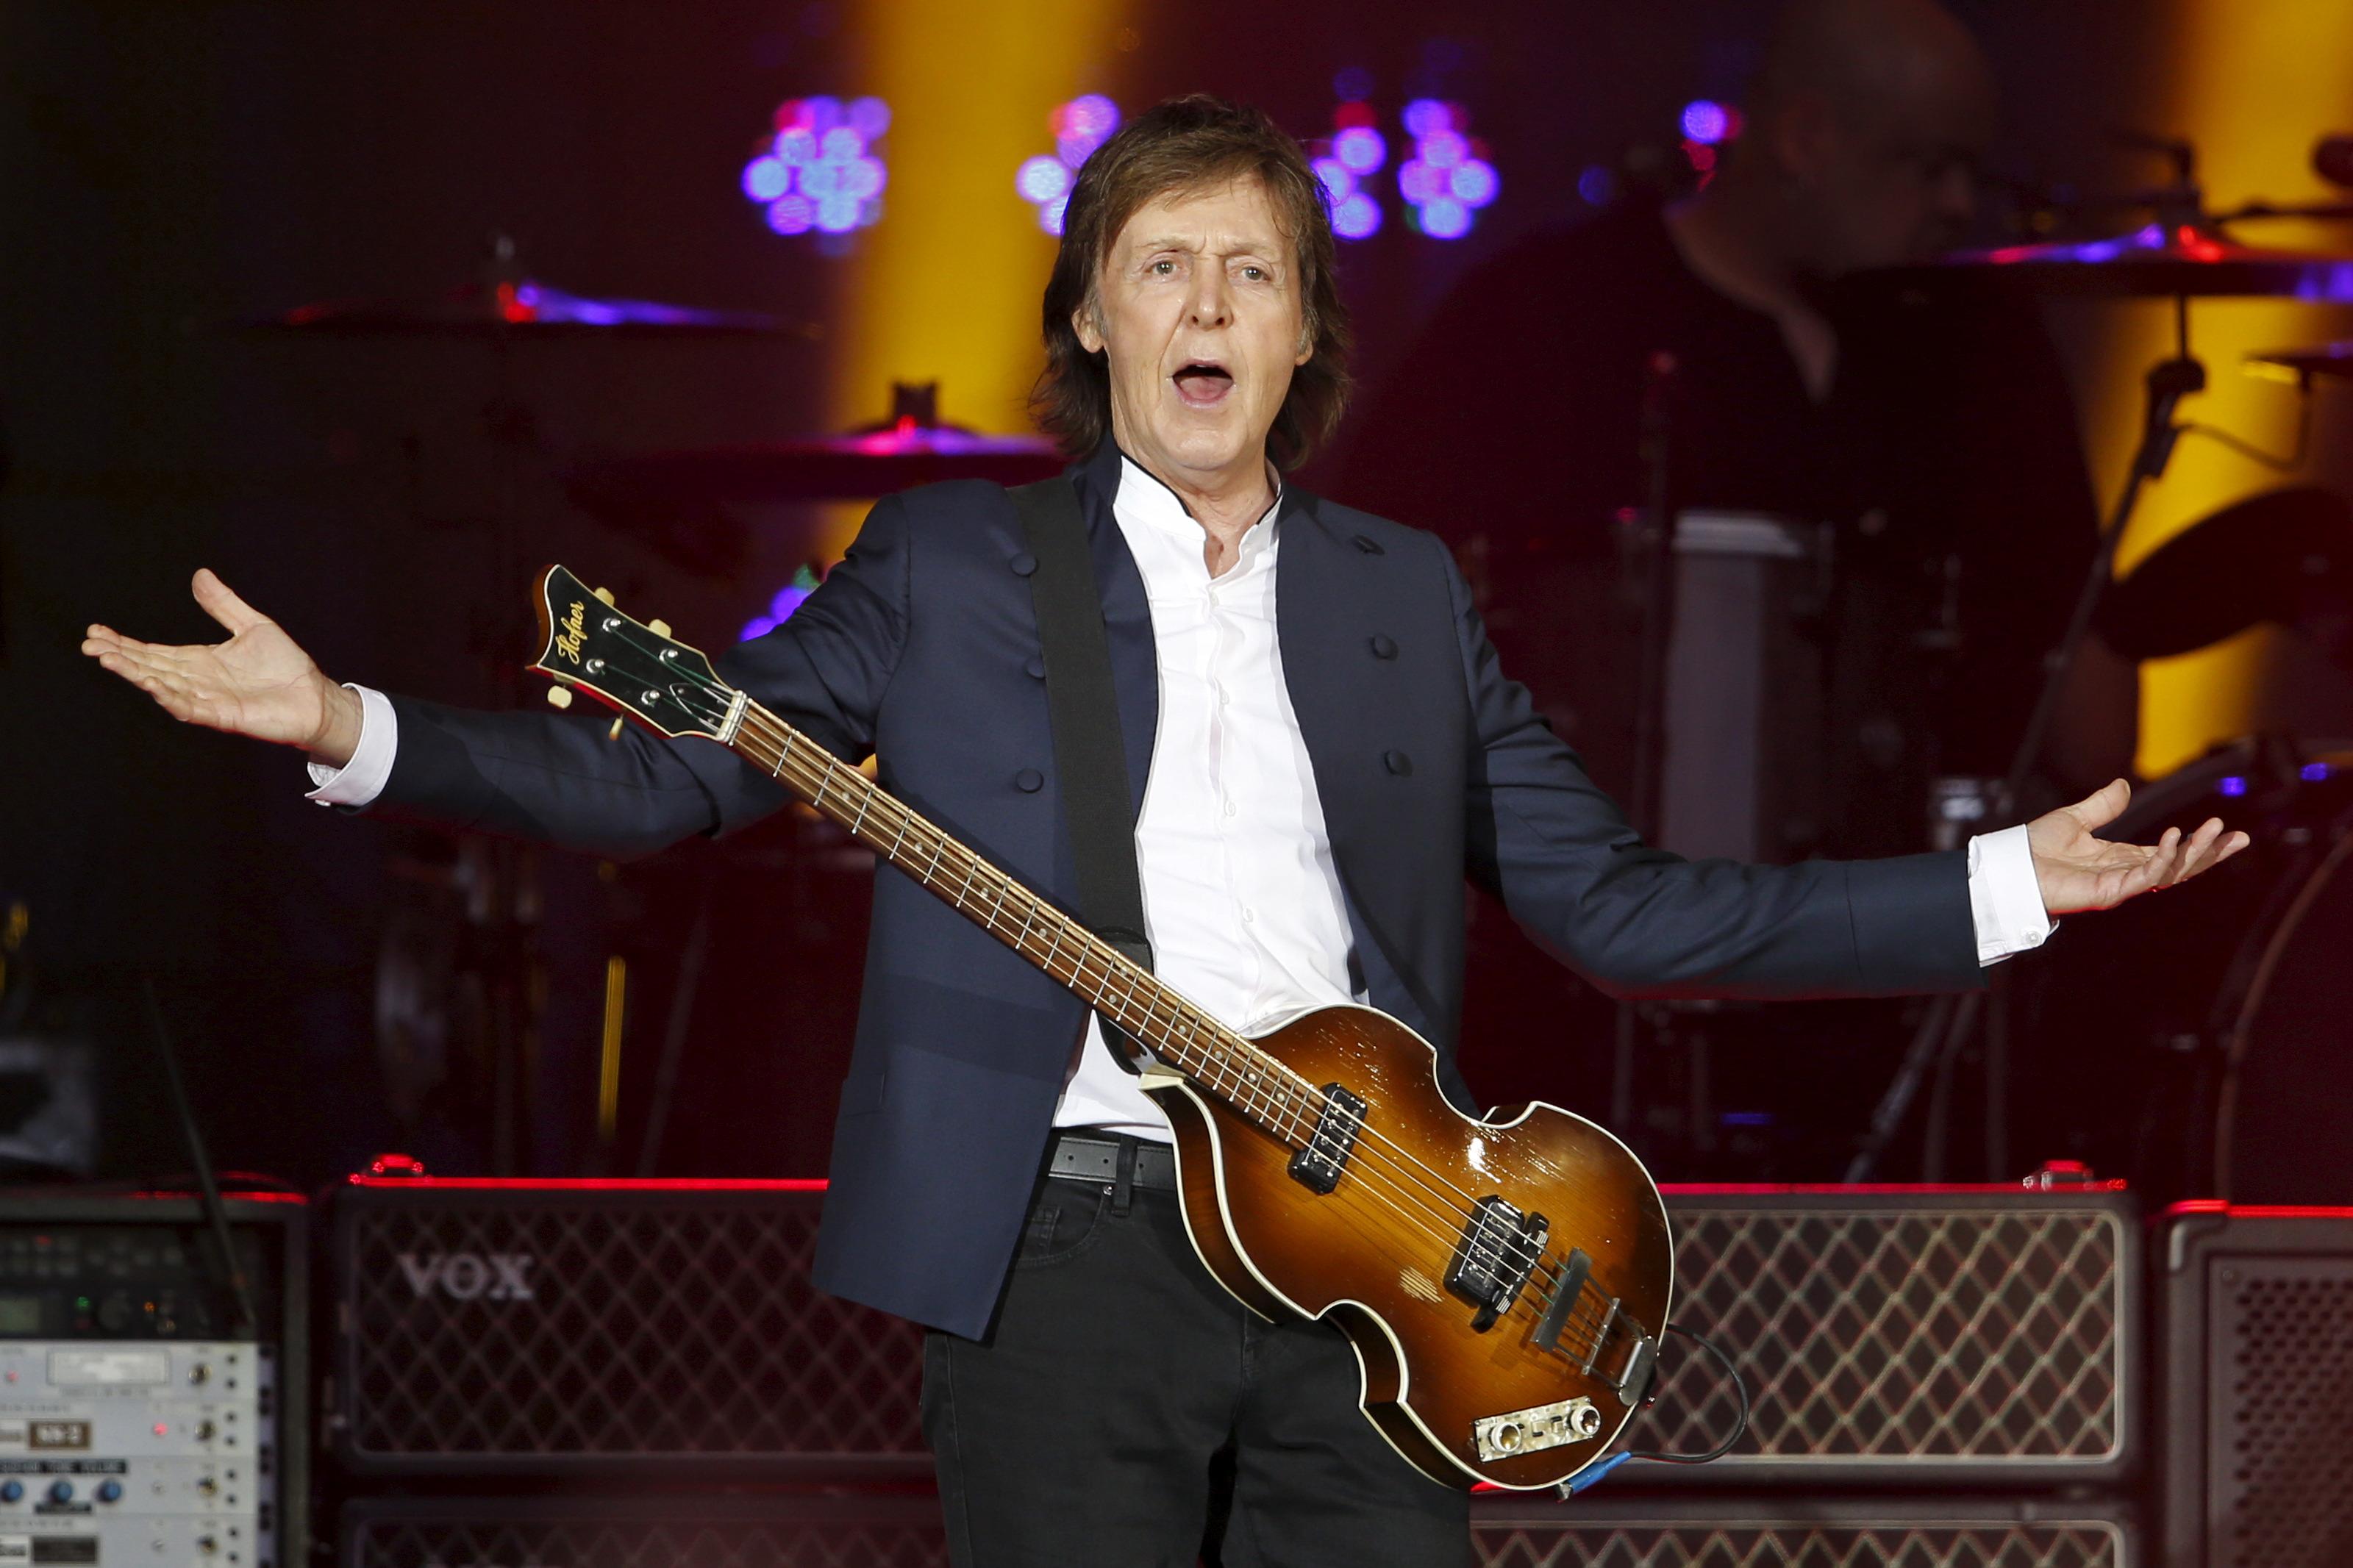 Paul McCartney performs at the Stade de France, in Saint-Denis, near Paris, France, June 11, 2015.